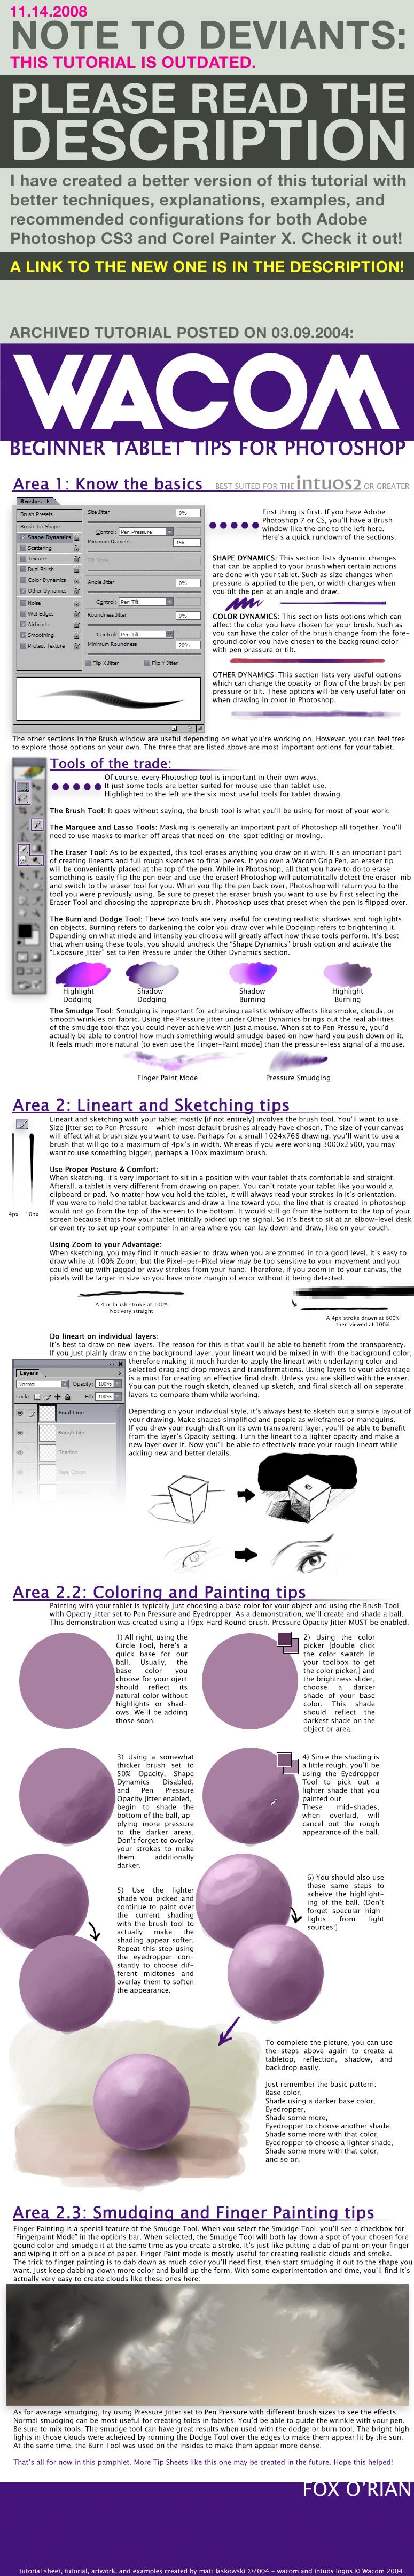 WACOM Starter Tablet Tips 2004 by fox-orian